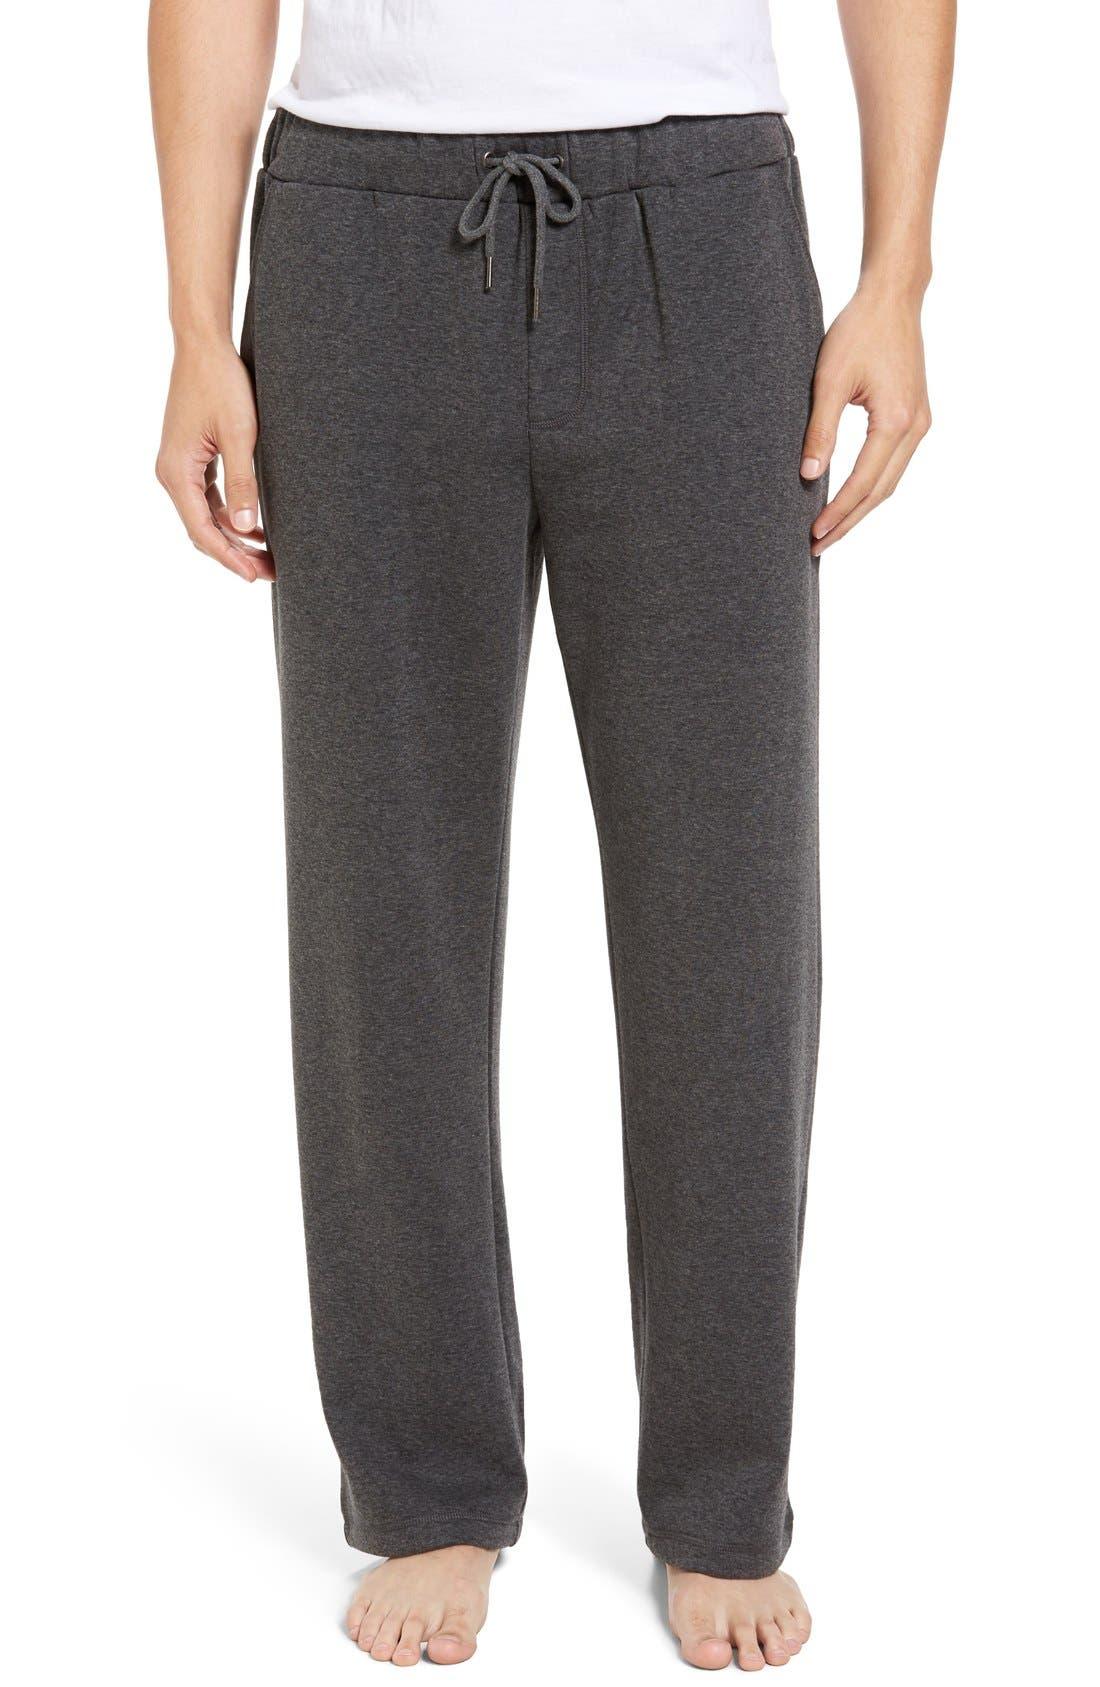 Main Image - Nordstrom Men's Shop Fleece Lounge Pants